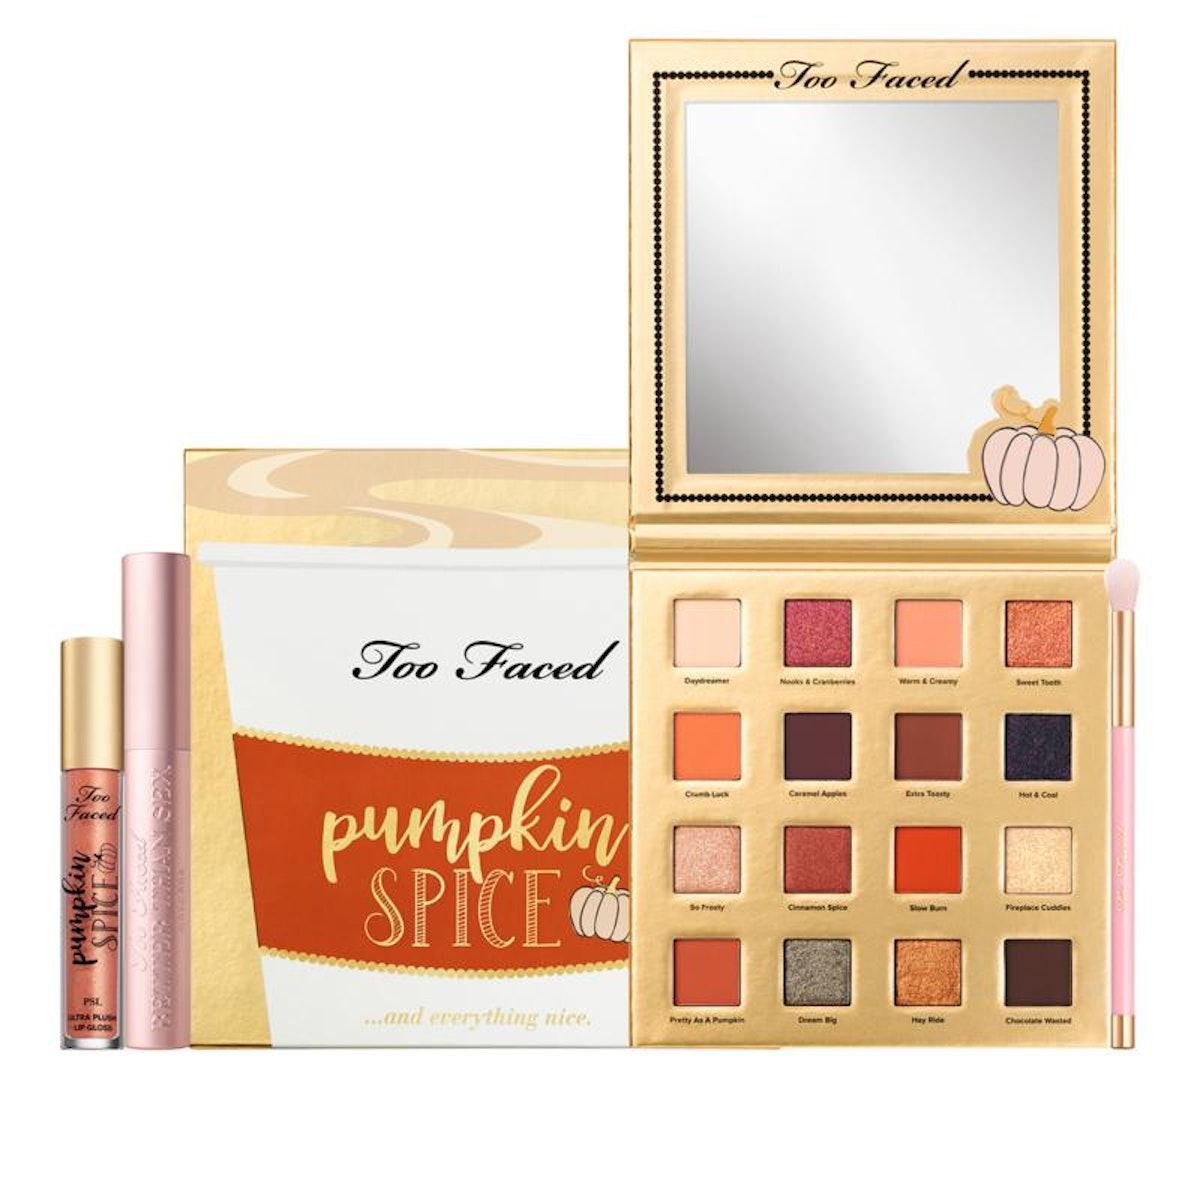 Too Faced Pumpkin Spice & Everything Nice Makeup Set